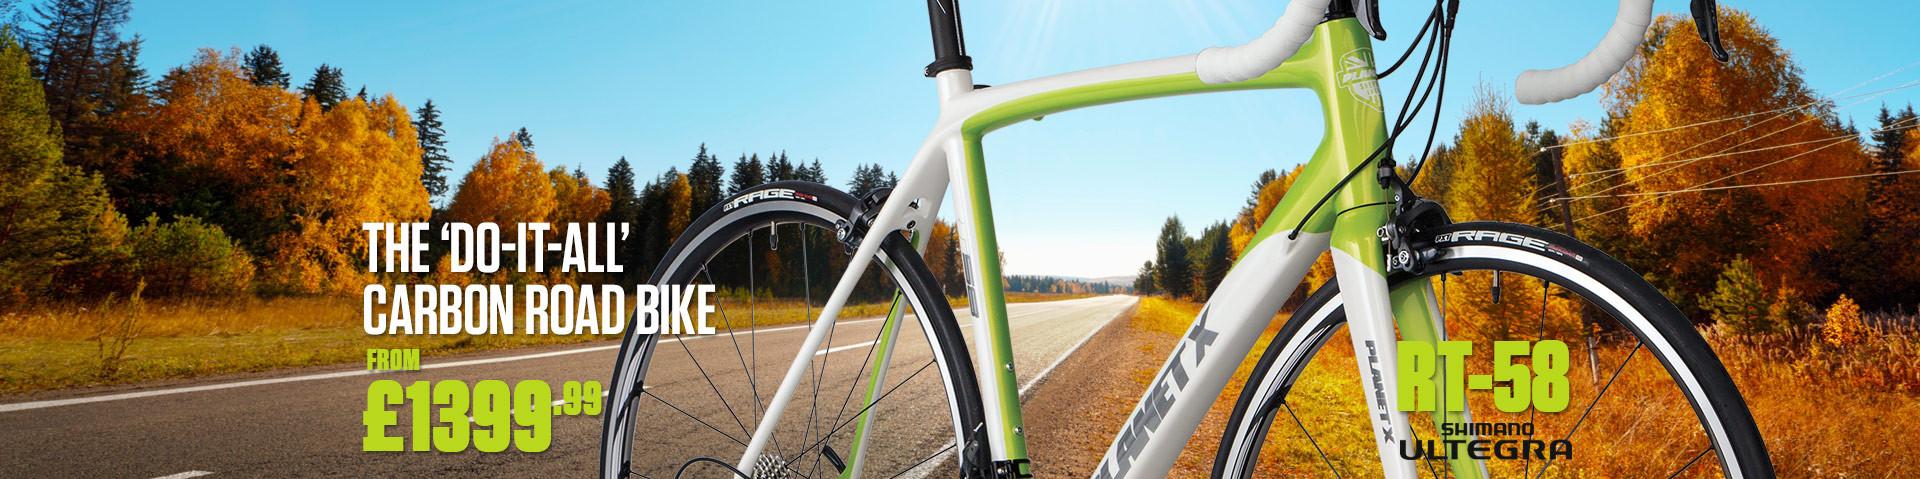 Planet X RT-58 Ultegra 6800 11 Road Bike